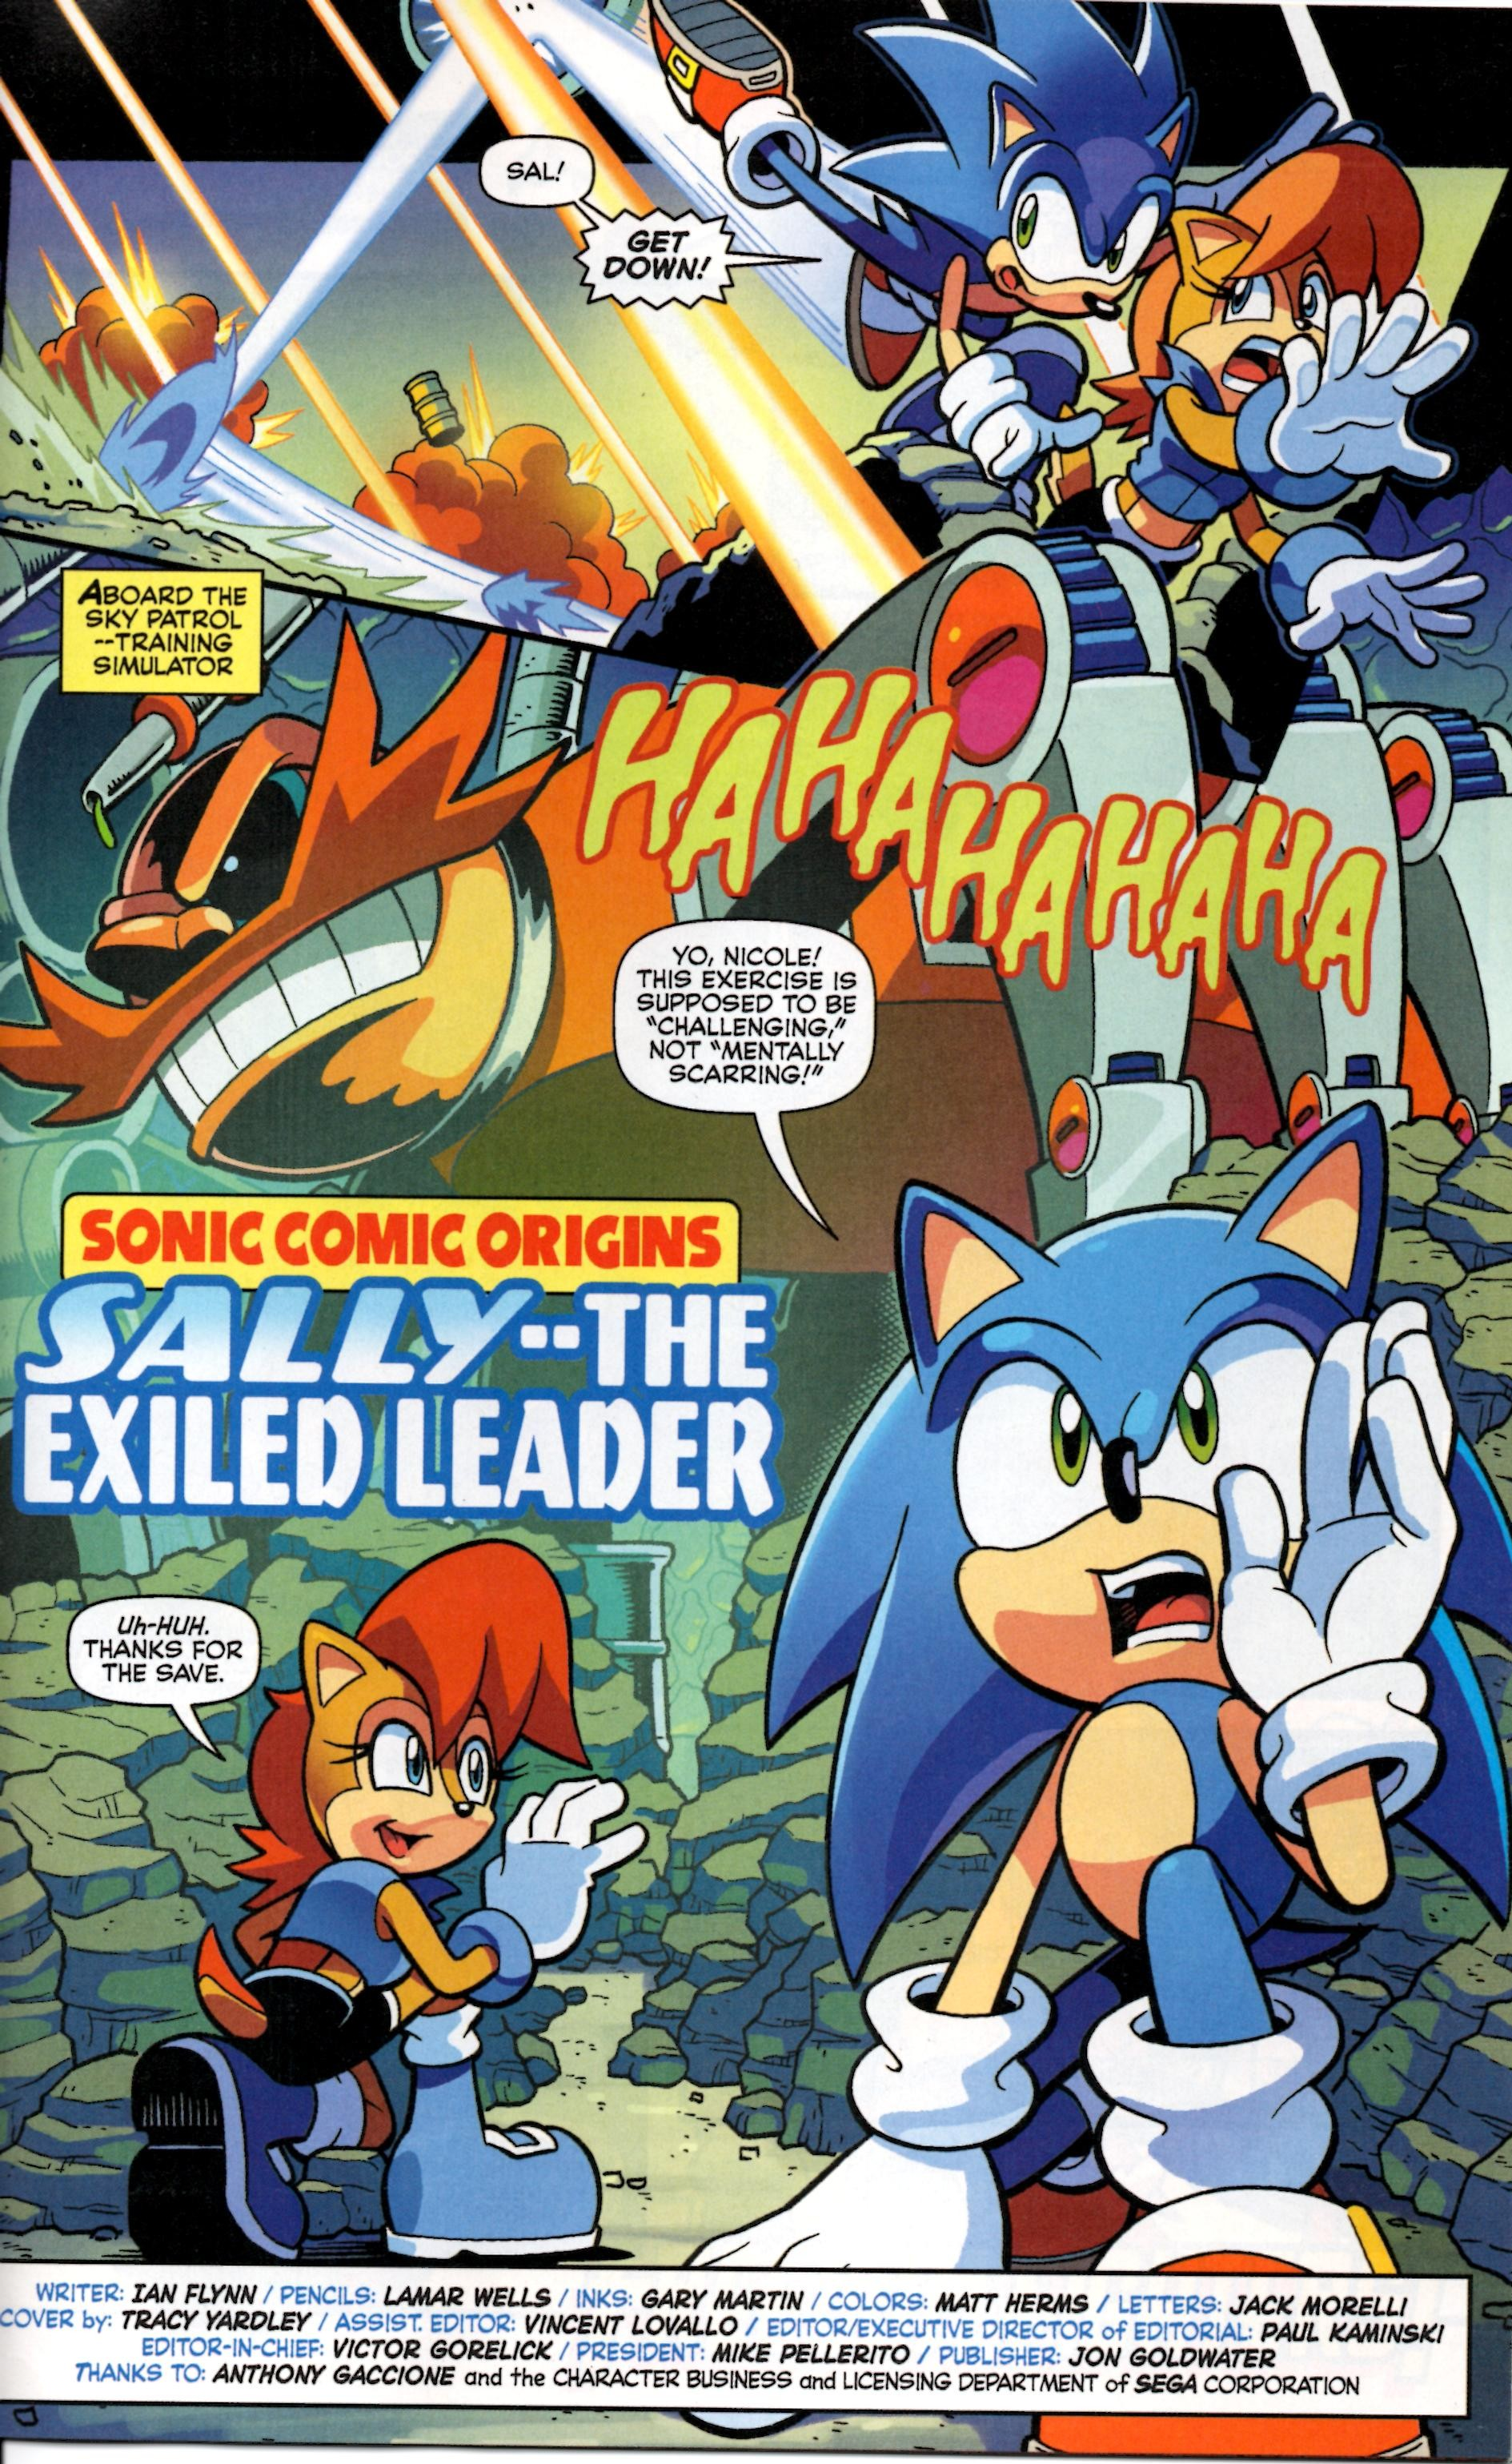 Sonic komiks porno